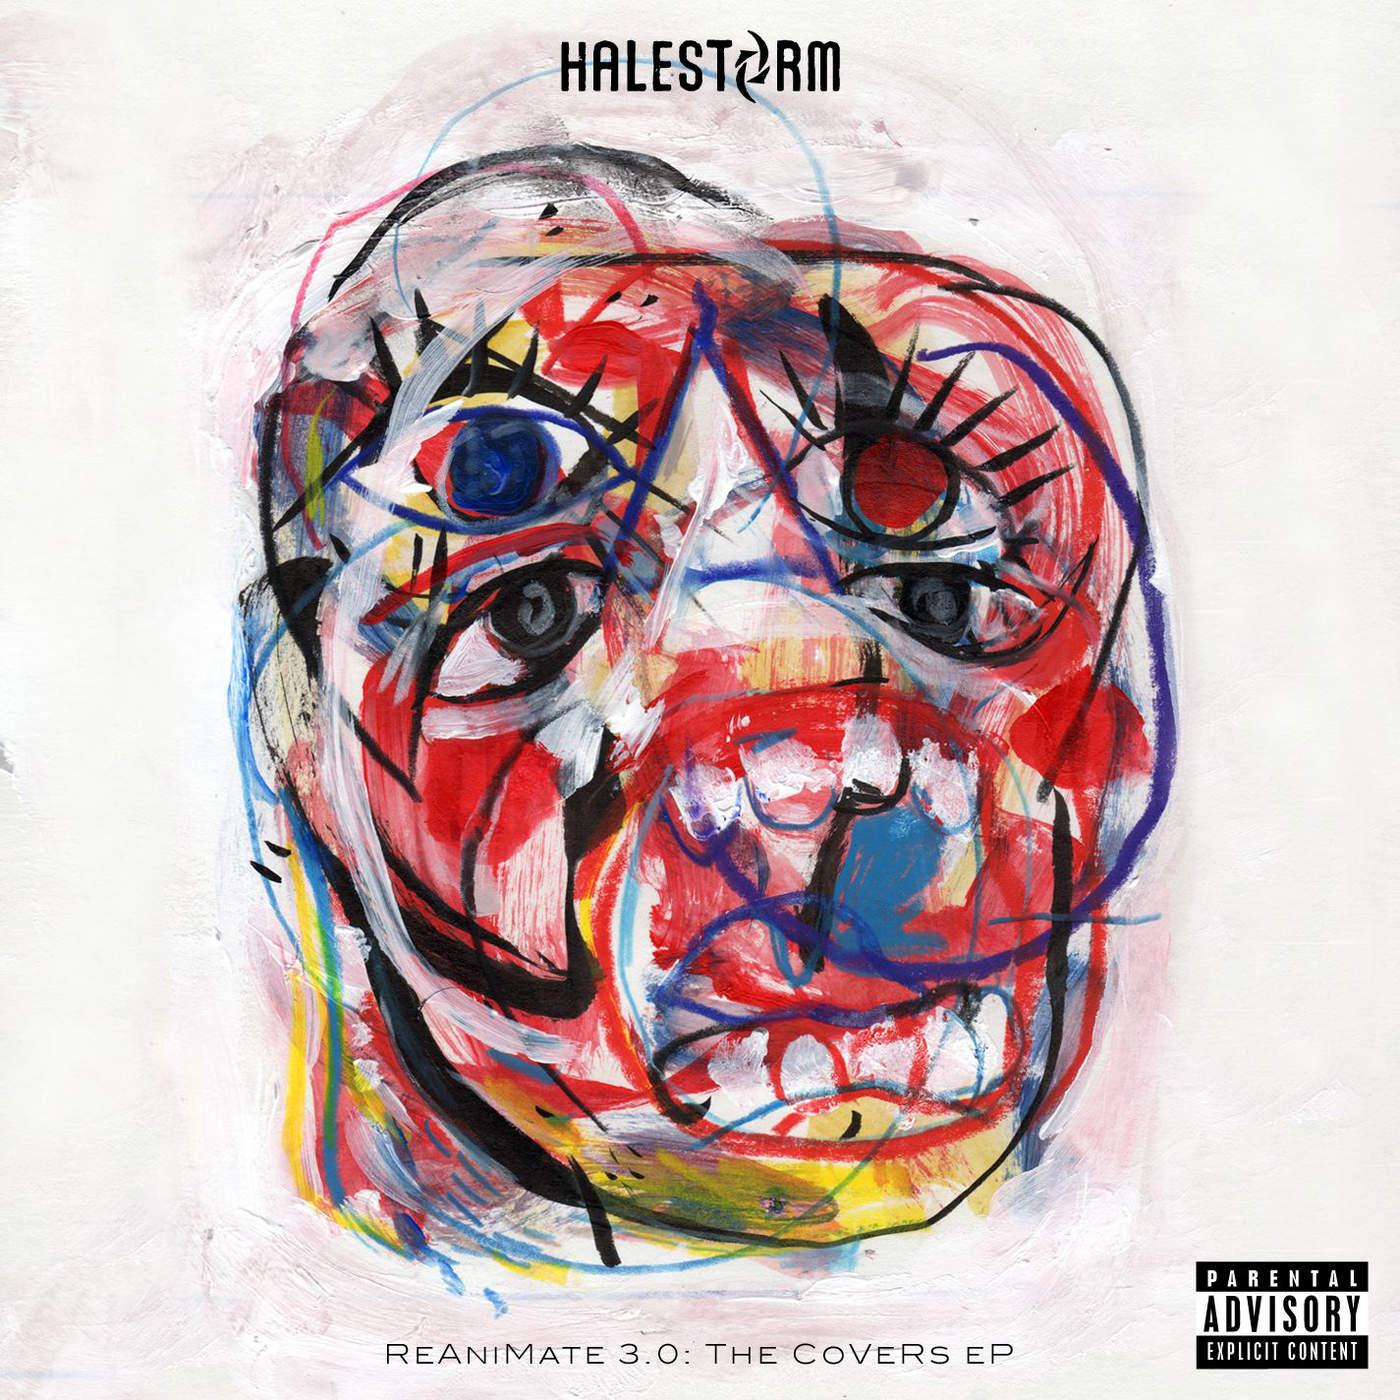 Halestorm The Reanimate 3 0 | Jake's Take